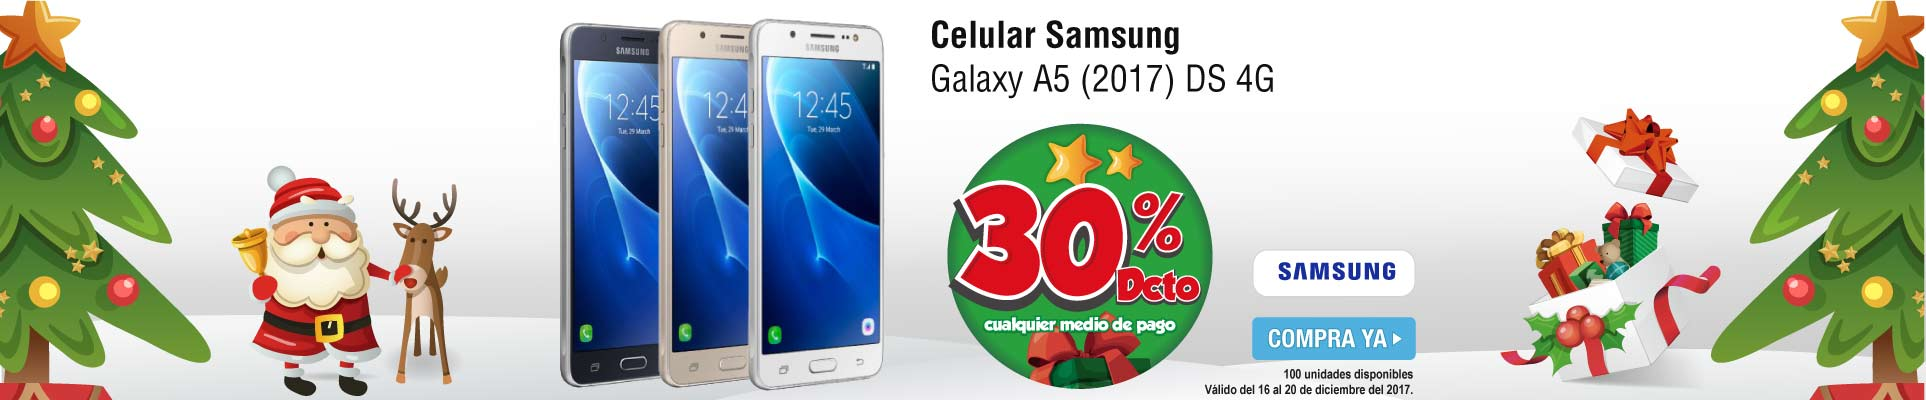 PPAL ALKP-3-celulares-Celular SAMSUNG Galaxy J5 Metal DS 4G-prod-septiembre23-26